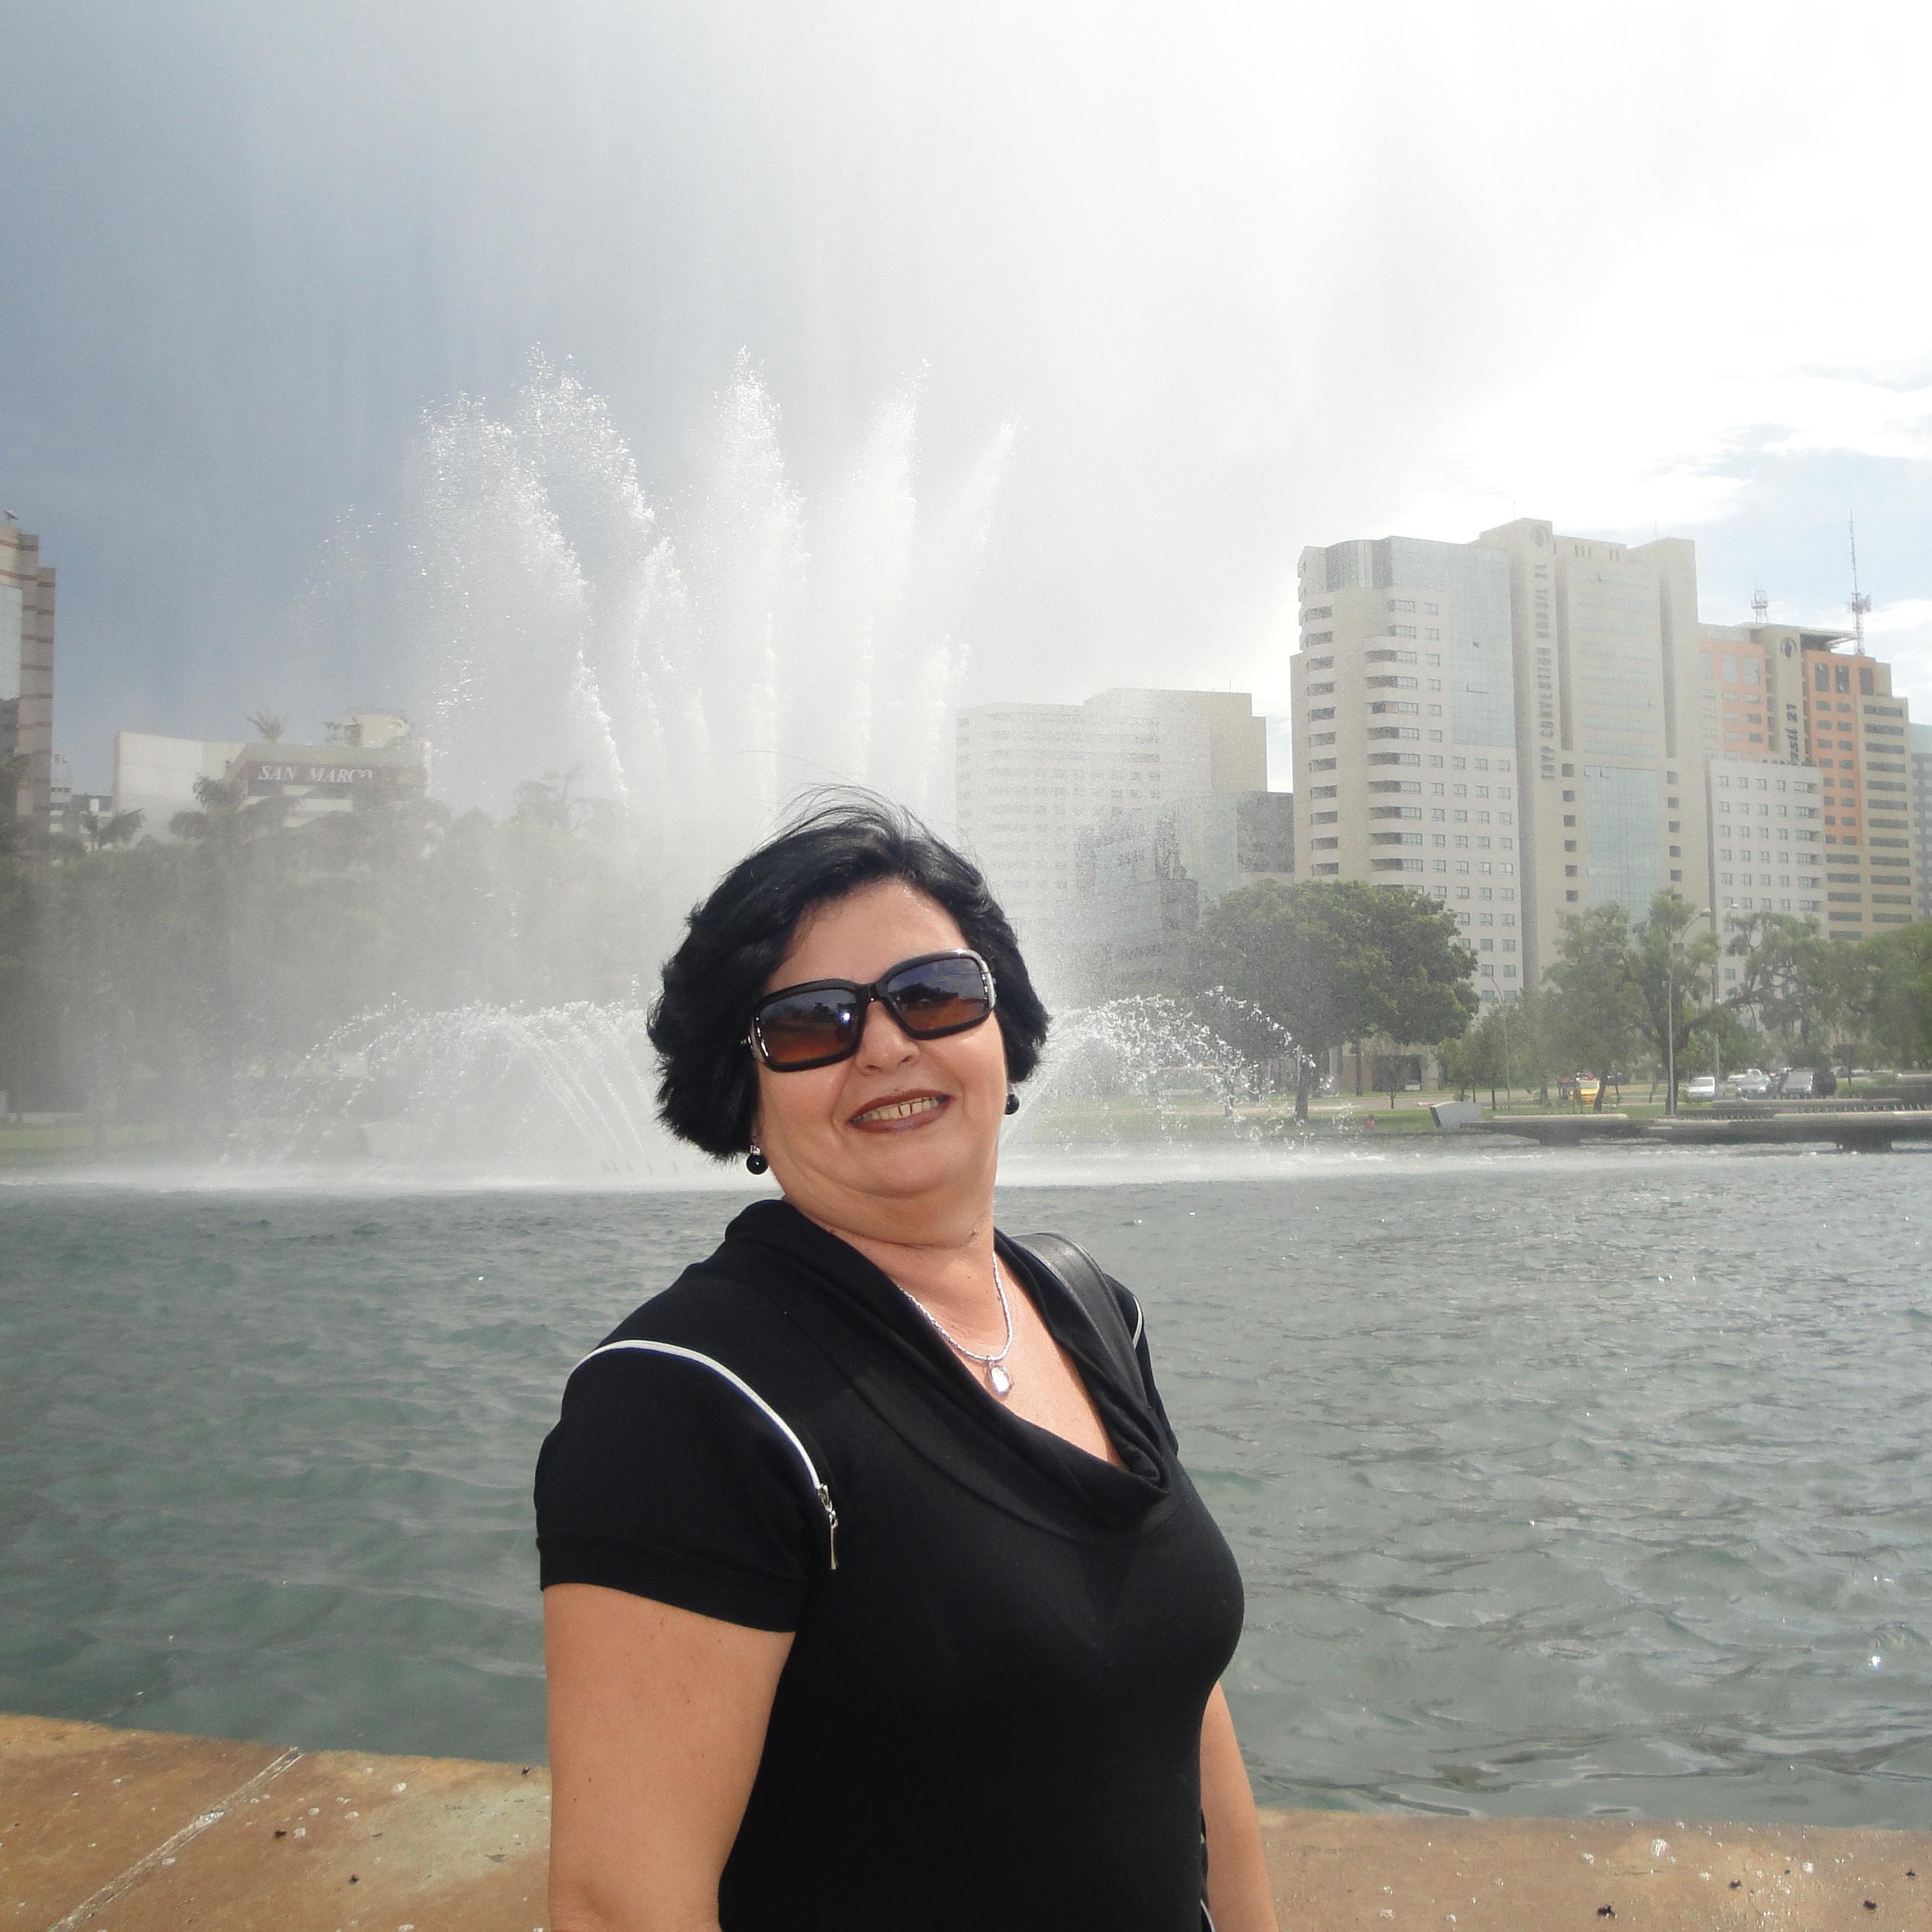 LUCIA R DA SILVA